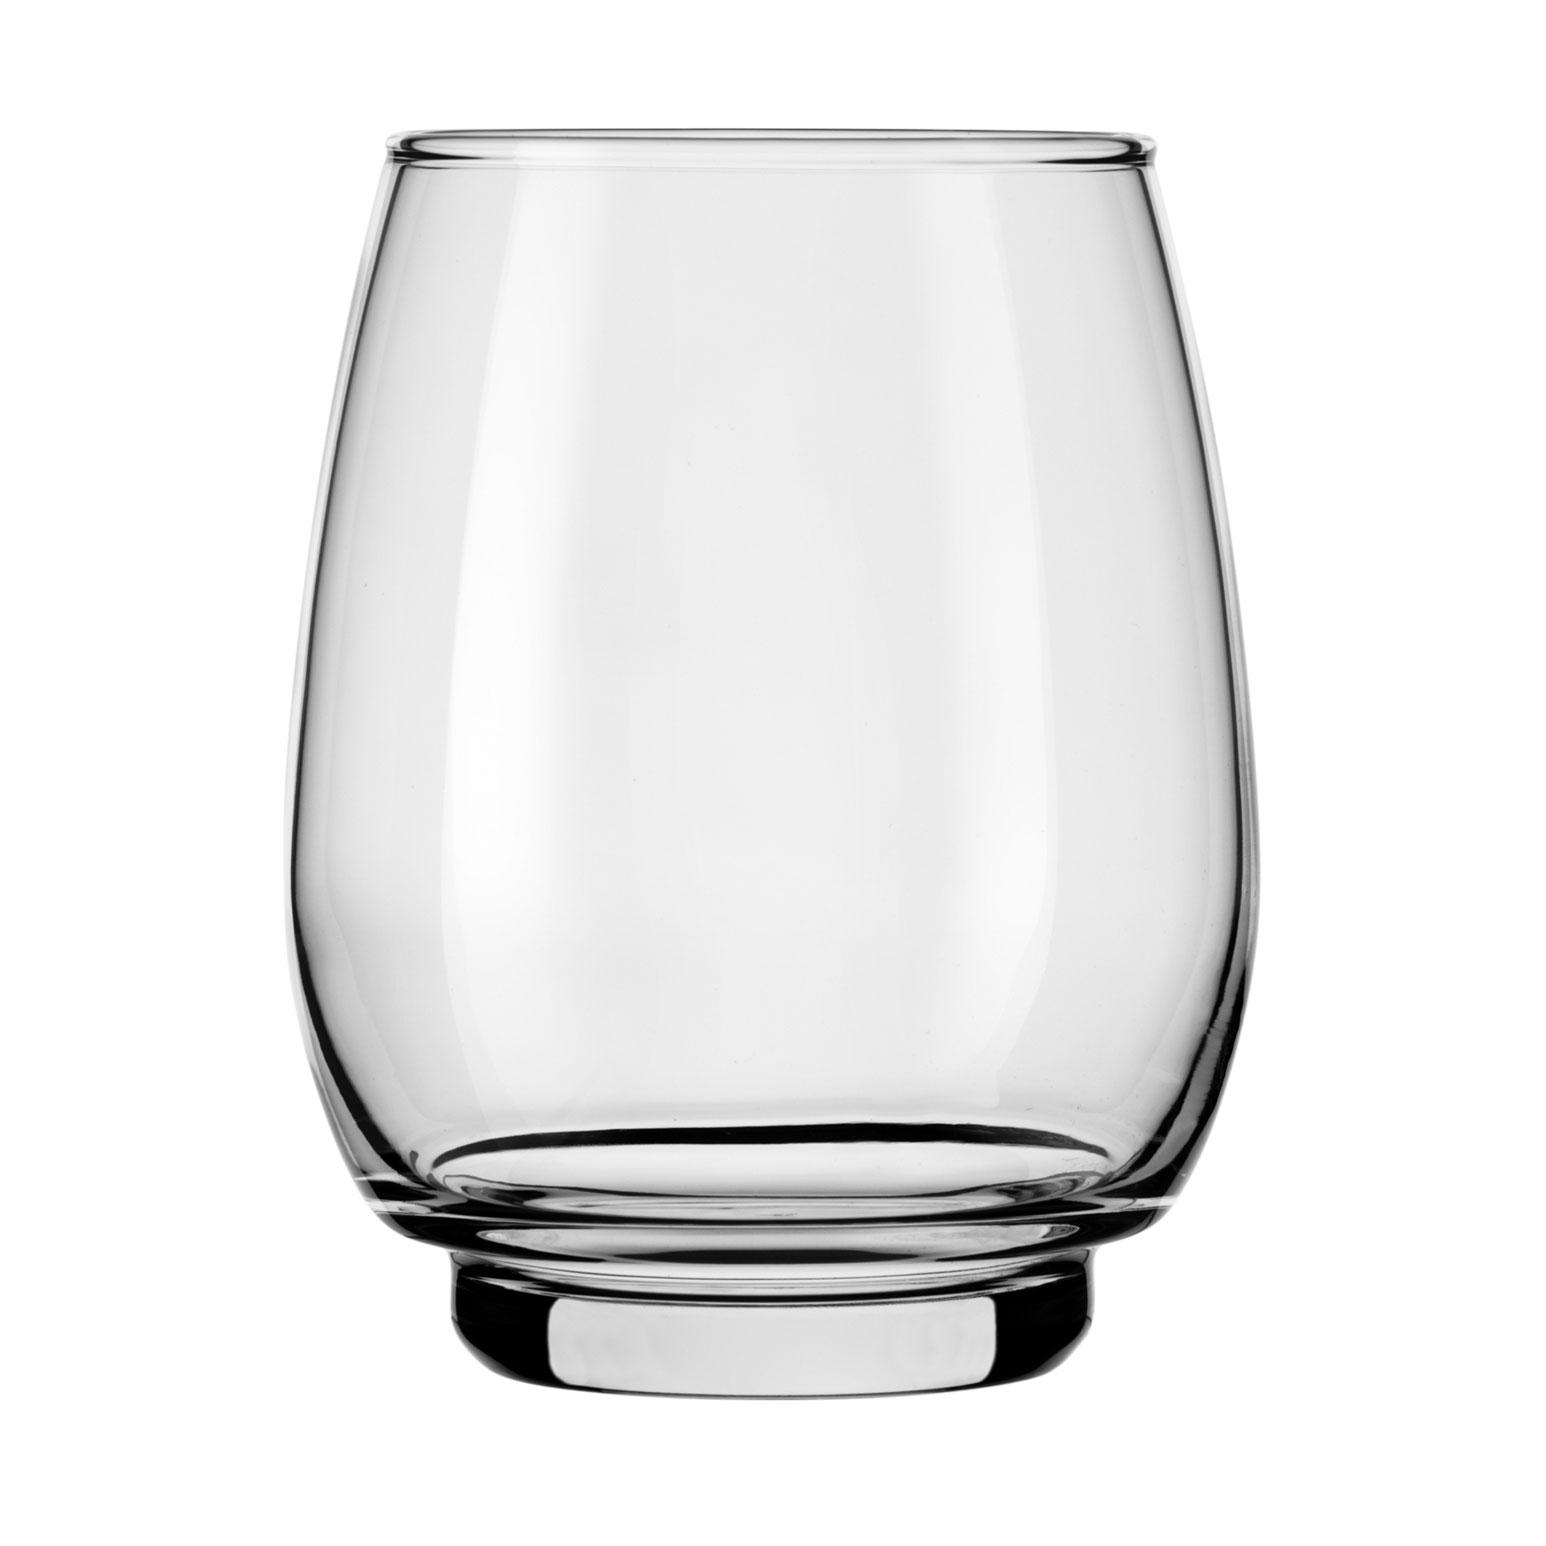 Libbey Glass 12017 glass, water / tumbler